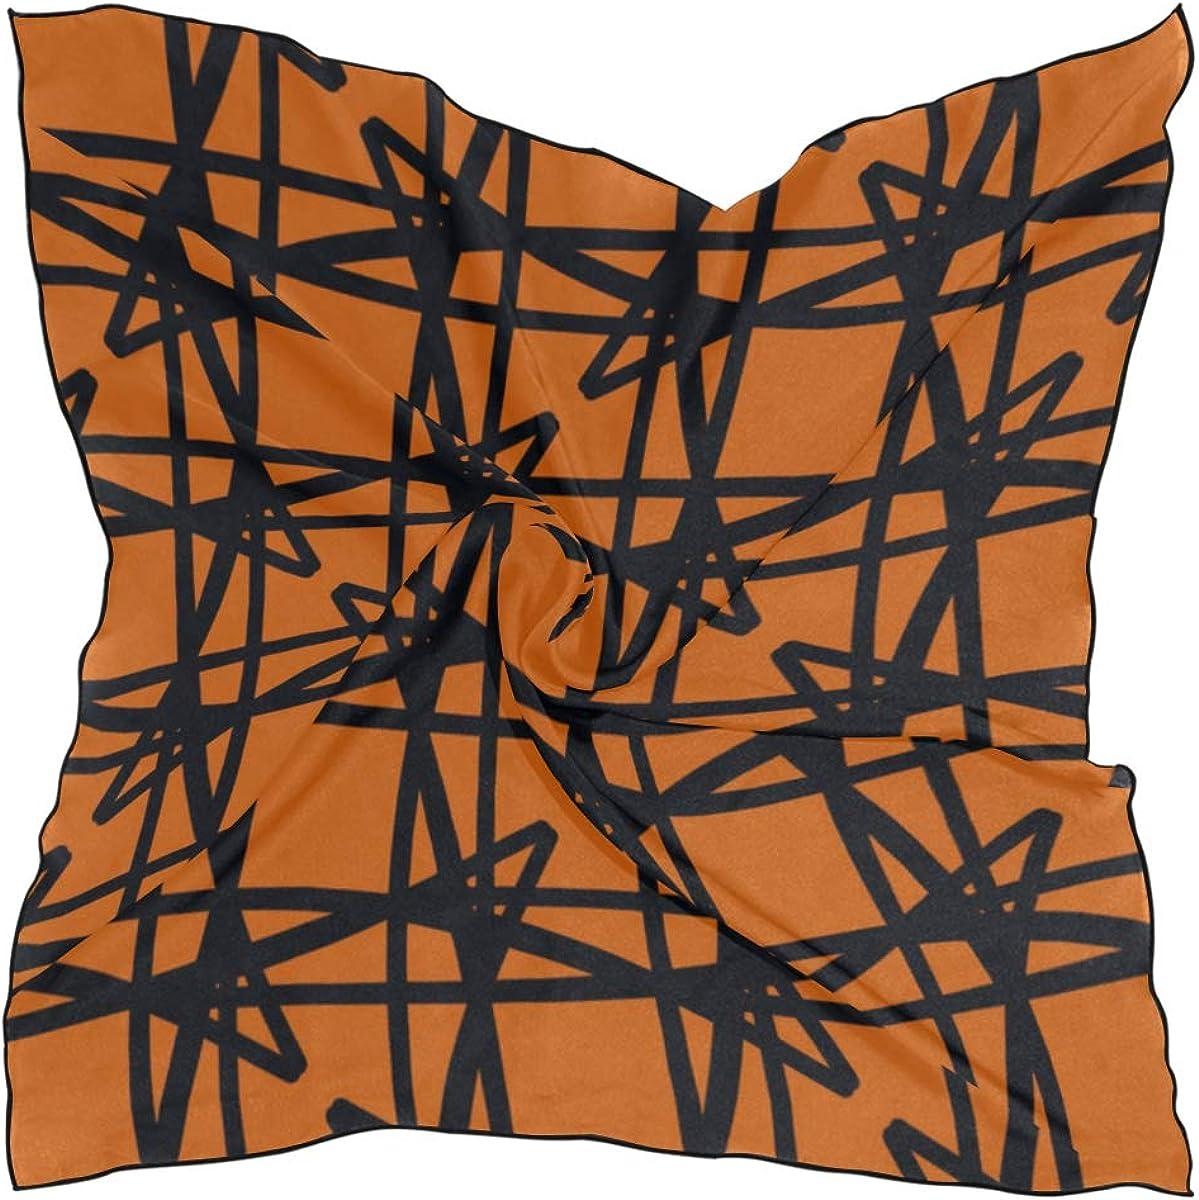 Women's Soft Polyester Silk Square Scarf Abstract Medieval Modern Grid Art Creative Fashion Print Head & Hair Scarf Neckerchief Accessory-23.6x23.6 Inch